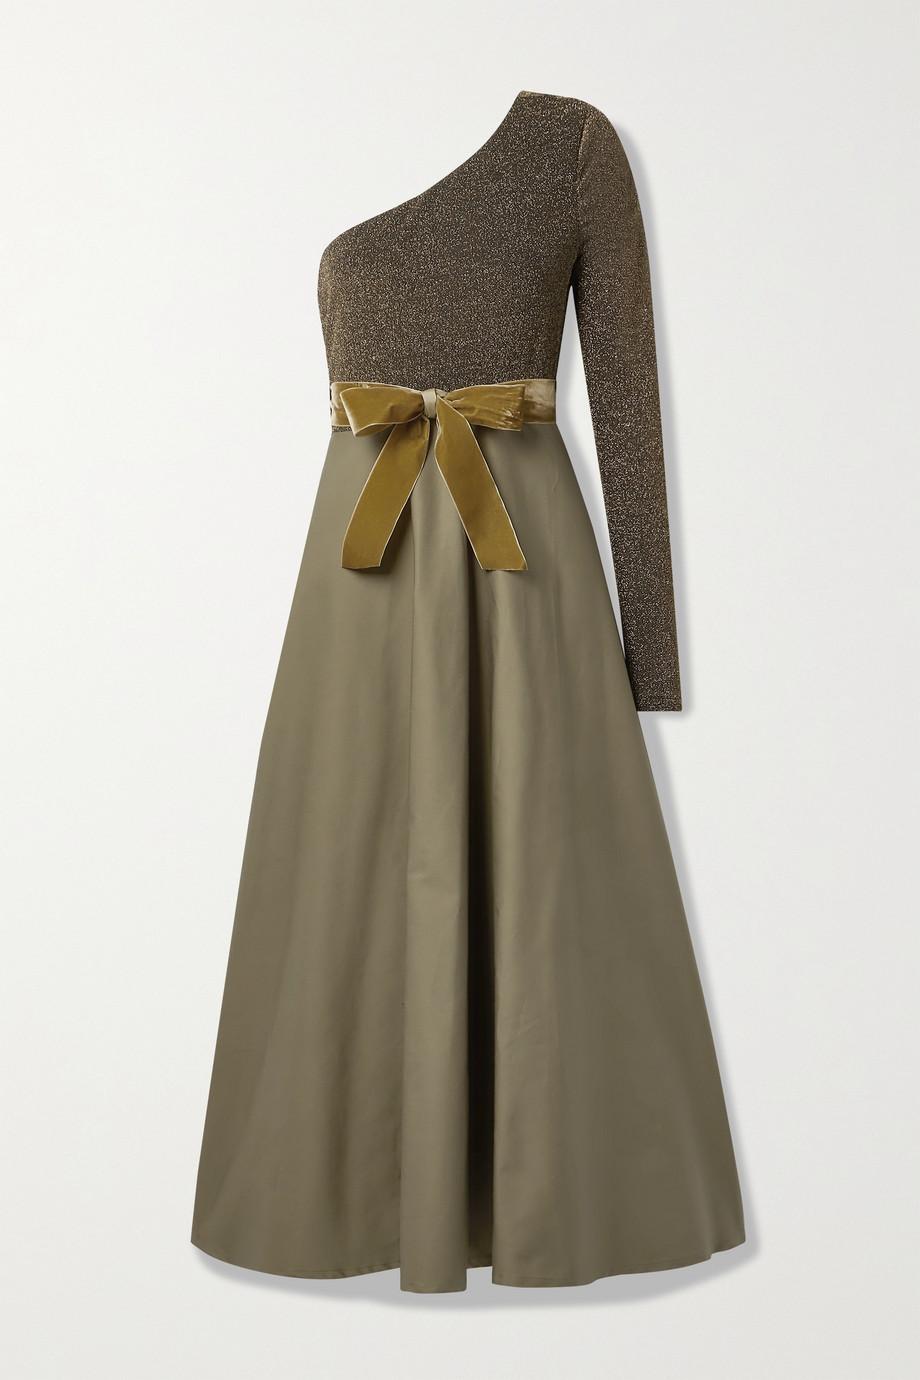 ARTCLUB + NET SUSTAIN Casa Miller one-sleeve velvet-trimmed cotton-twill and stretch-Lurex wrap maxi dress